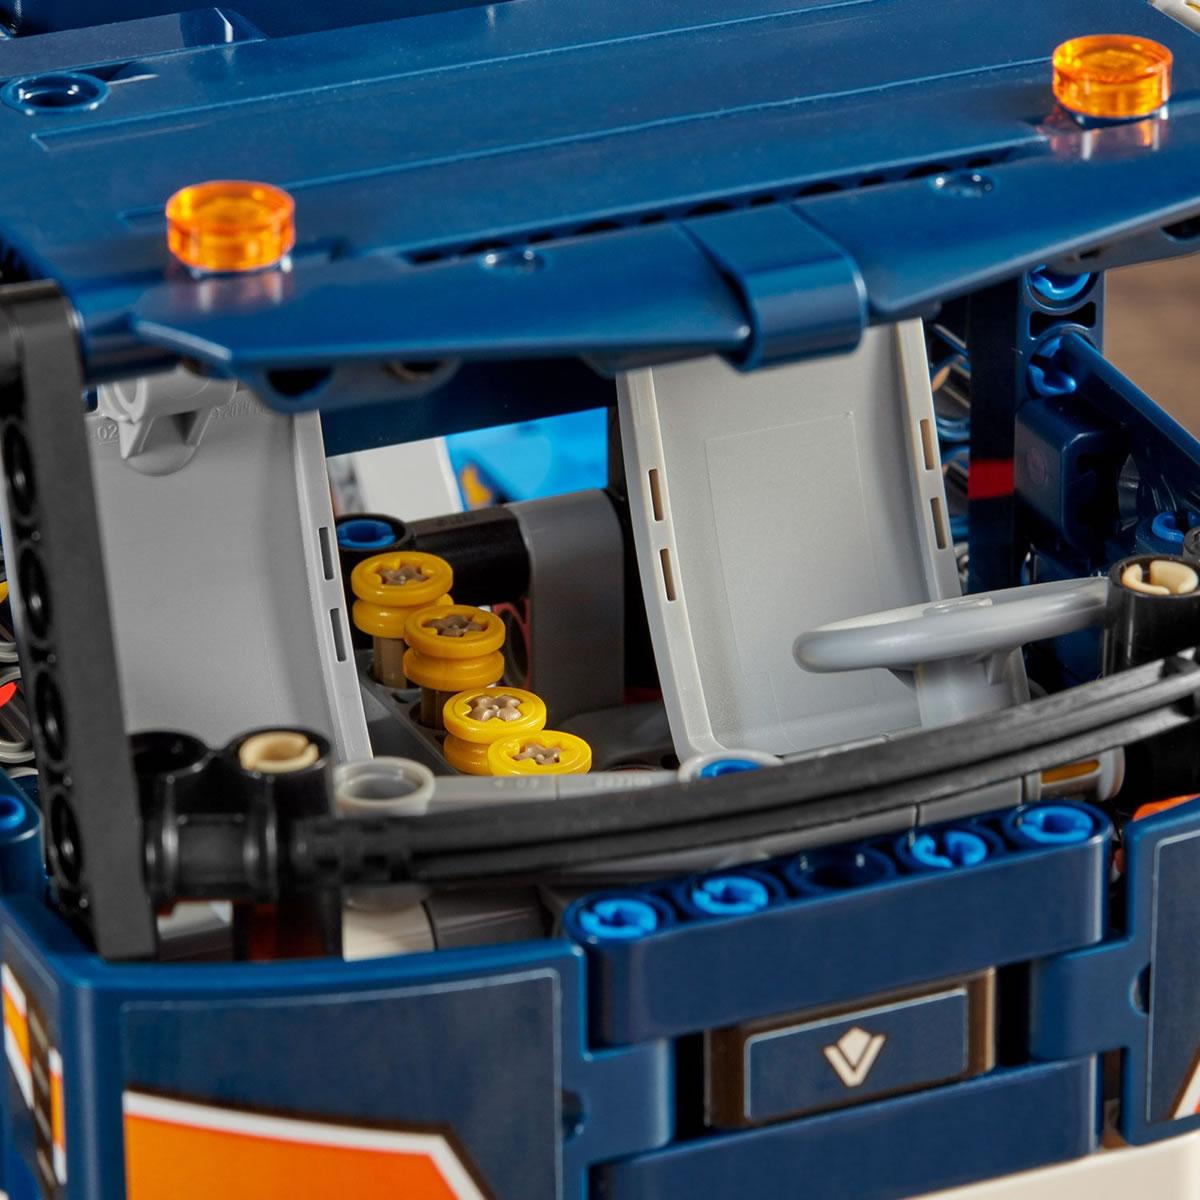 lego-technic-42112-betonmischer-lkw-2020-cockpit zusammengebaut.com